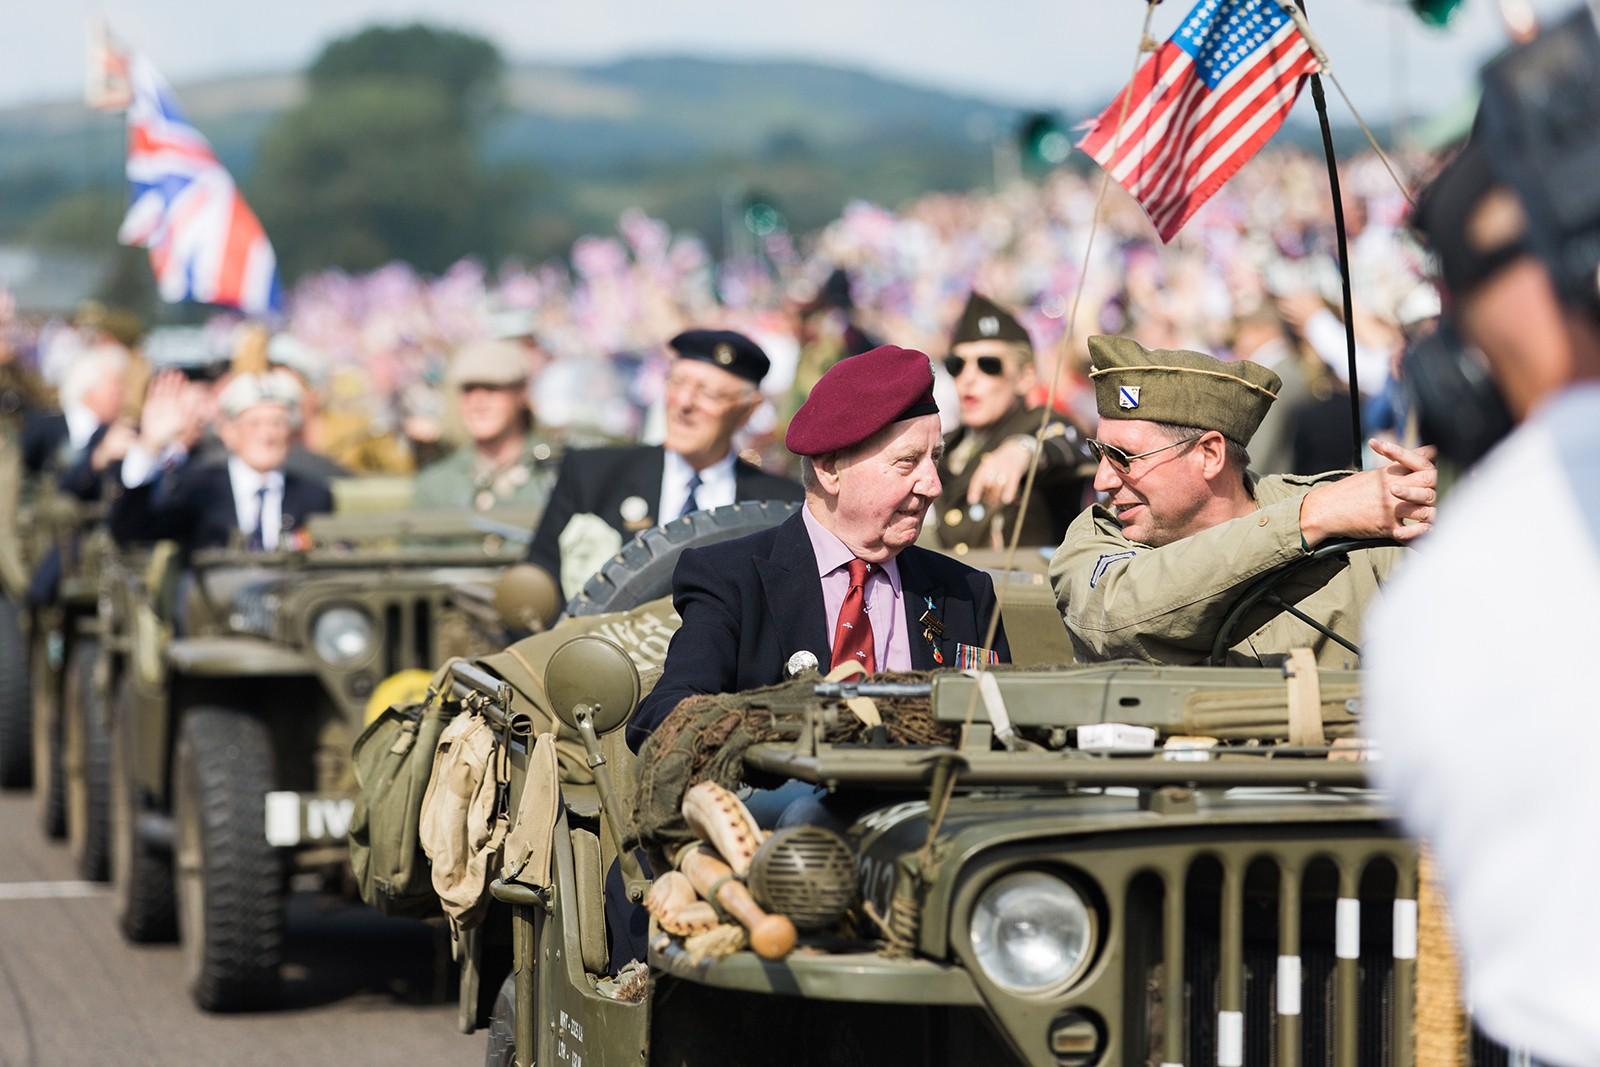 WW2 Veterans motorcade at Goodwood Revival